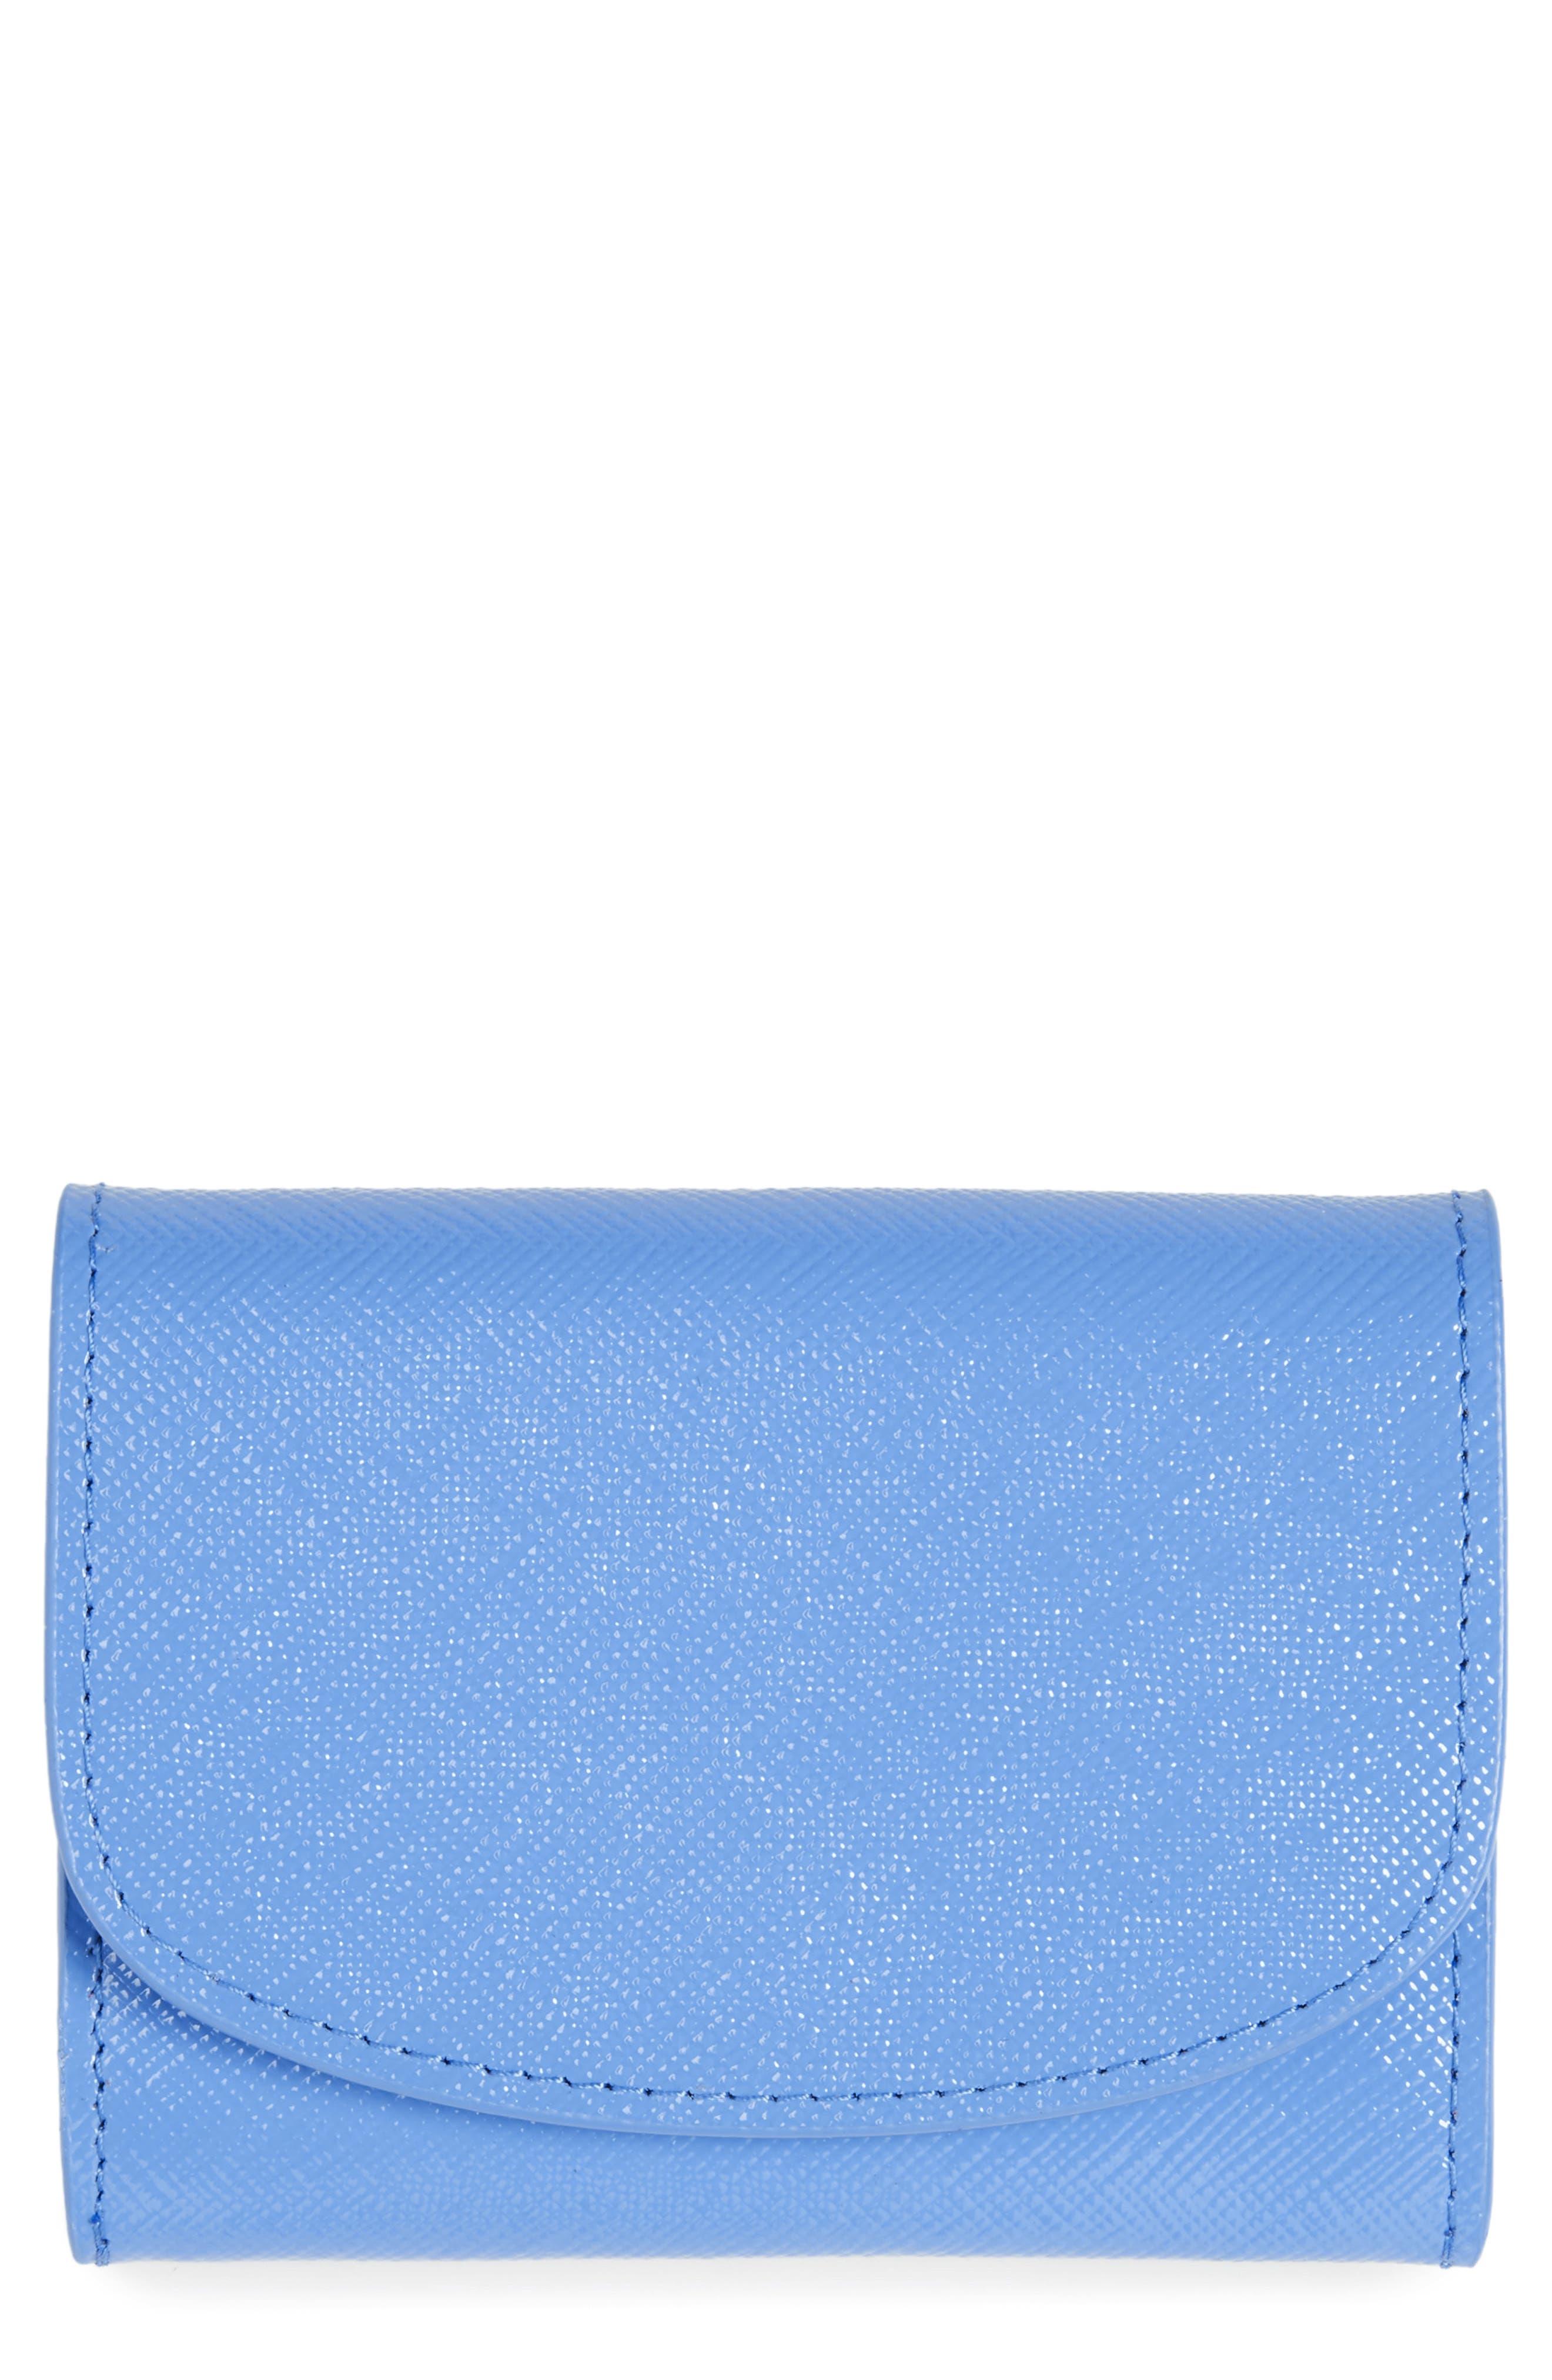 Leather Card Holder,                             Main thumbnail 1, color,                             Blue Regatta